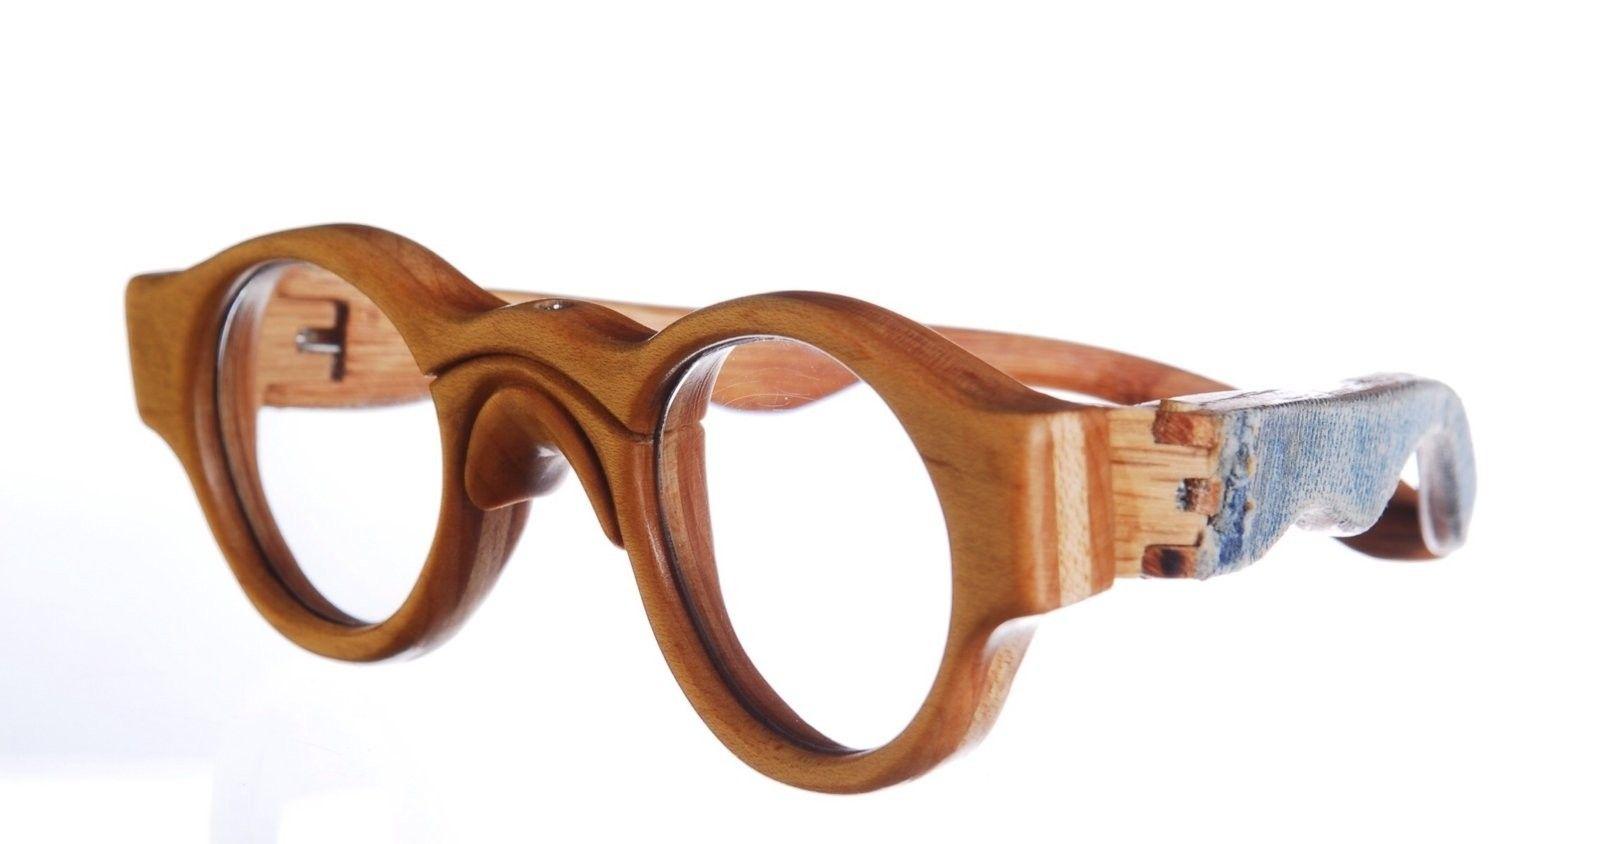 Spectacular Handmade Wooden Sunglasses - 2016-05 Jaromir Round 10.jpg